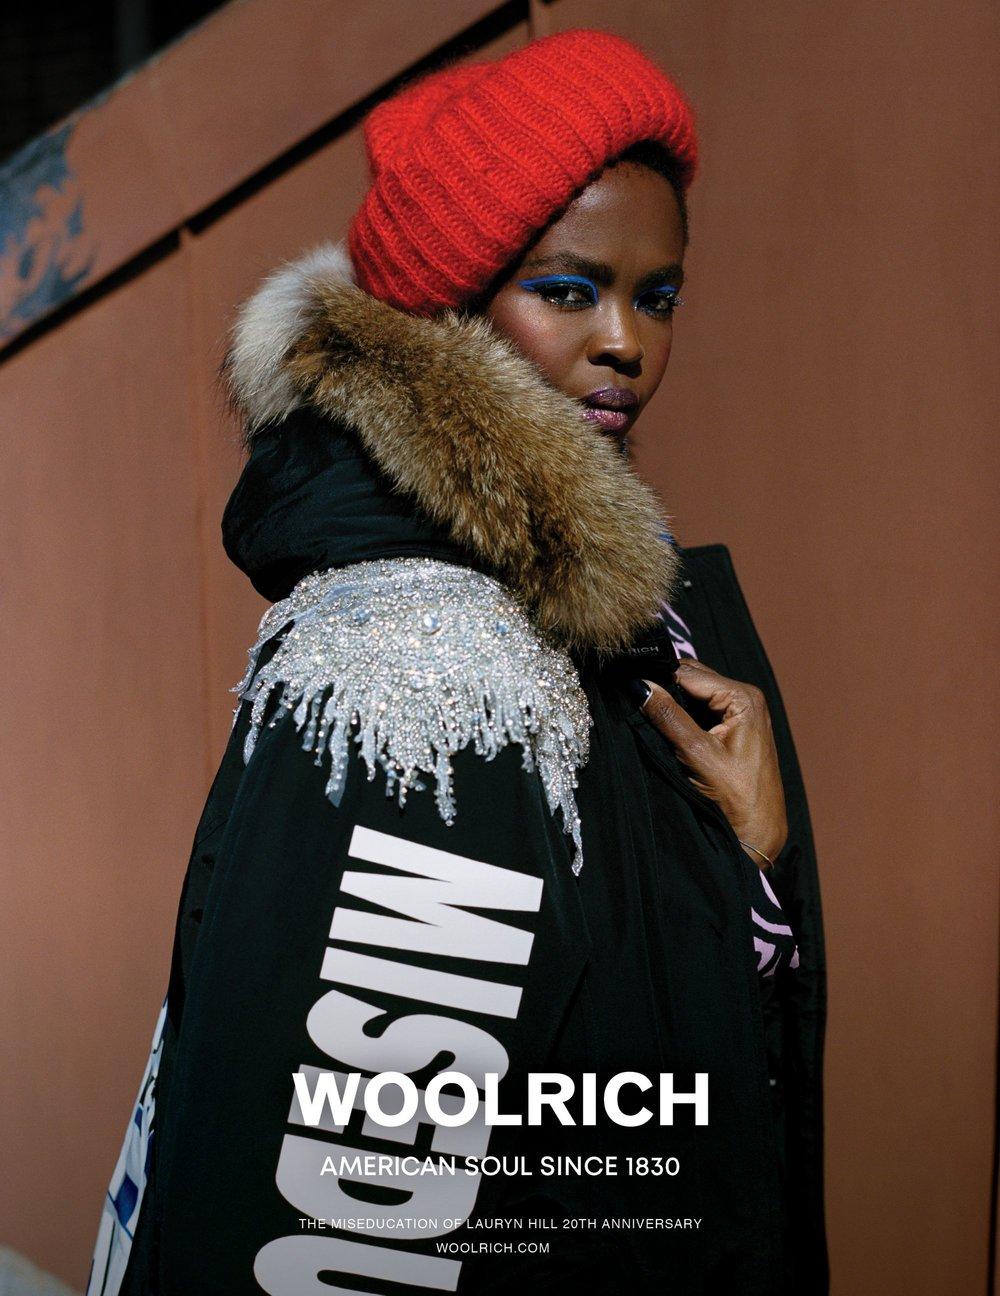 Woolrich-FW-18-ADV-Campaign-8.jpg